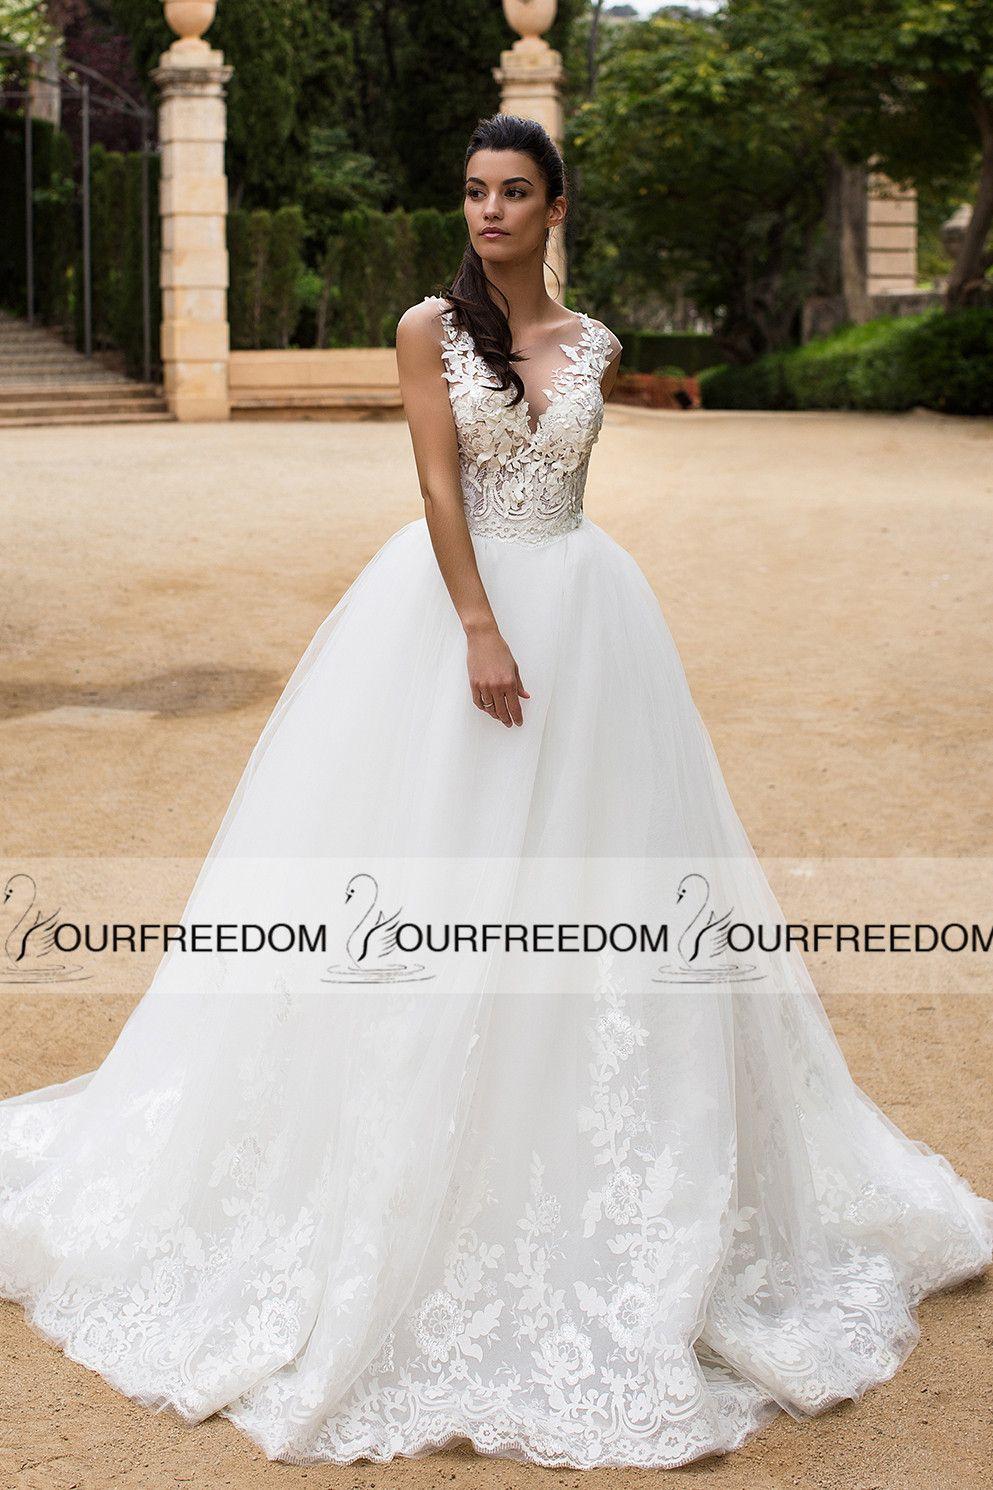 2020 Sheer Jewel Ausschnitt A Line Brautkleider rückseitige Abdeckung Knopf Hofzug Brautkleid Land-Art Günstige Boho Brautkleid Hot